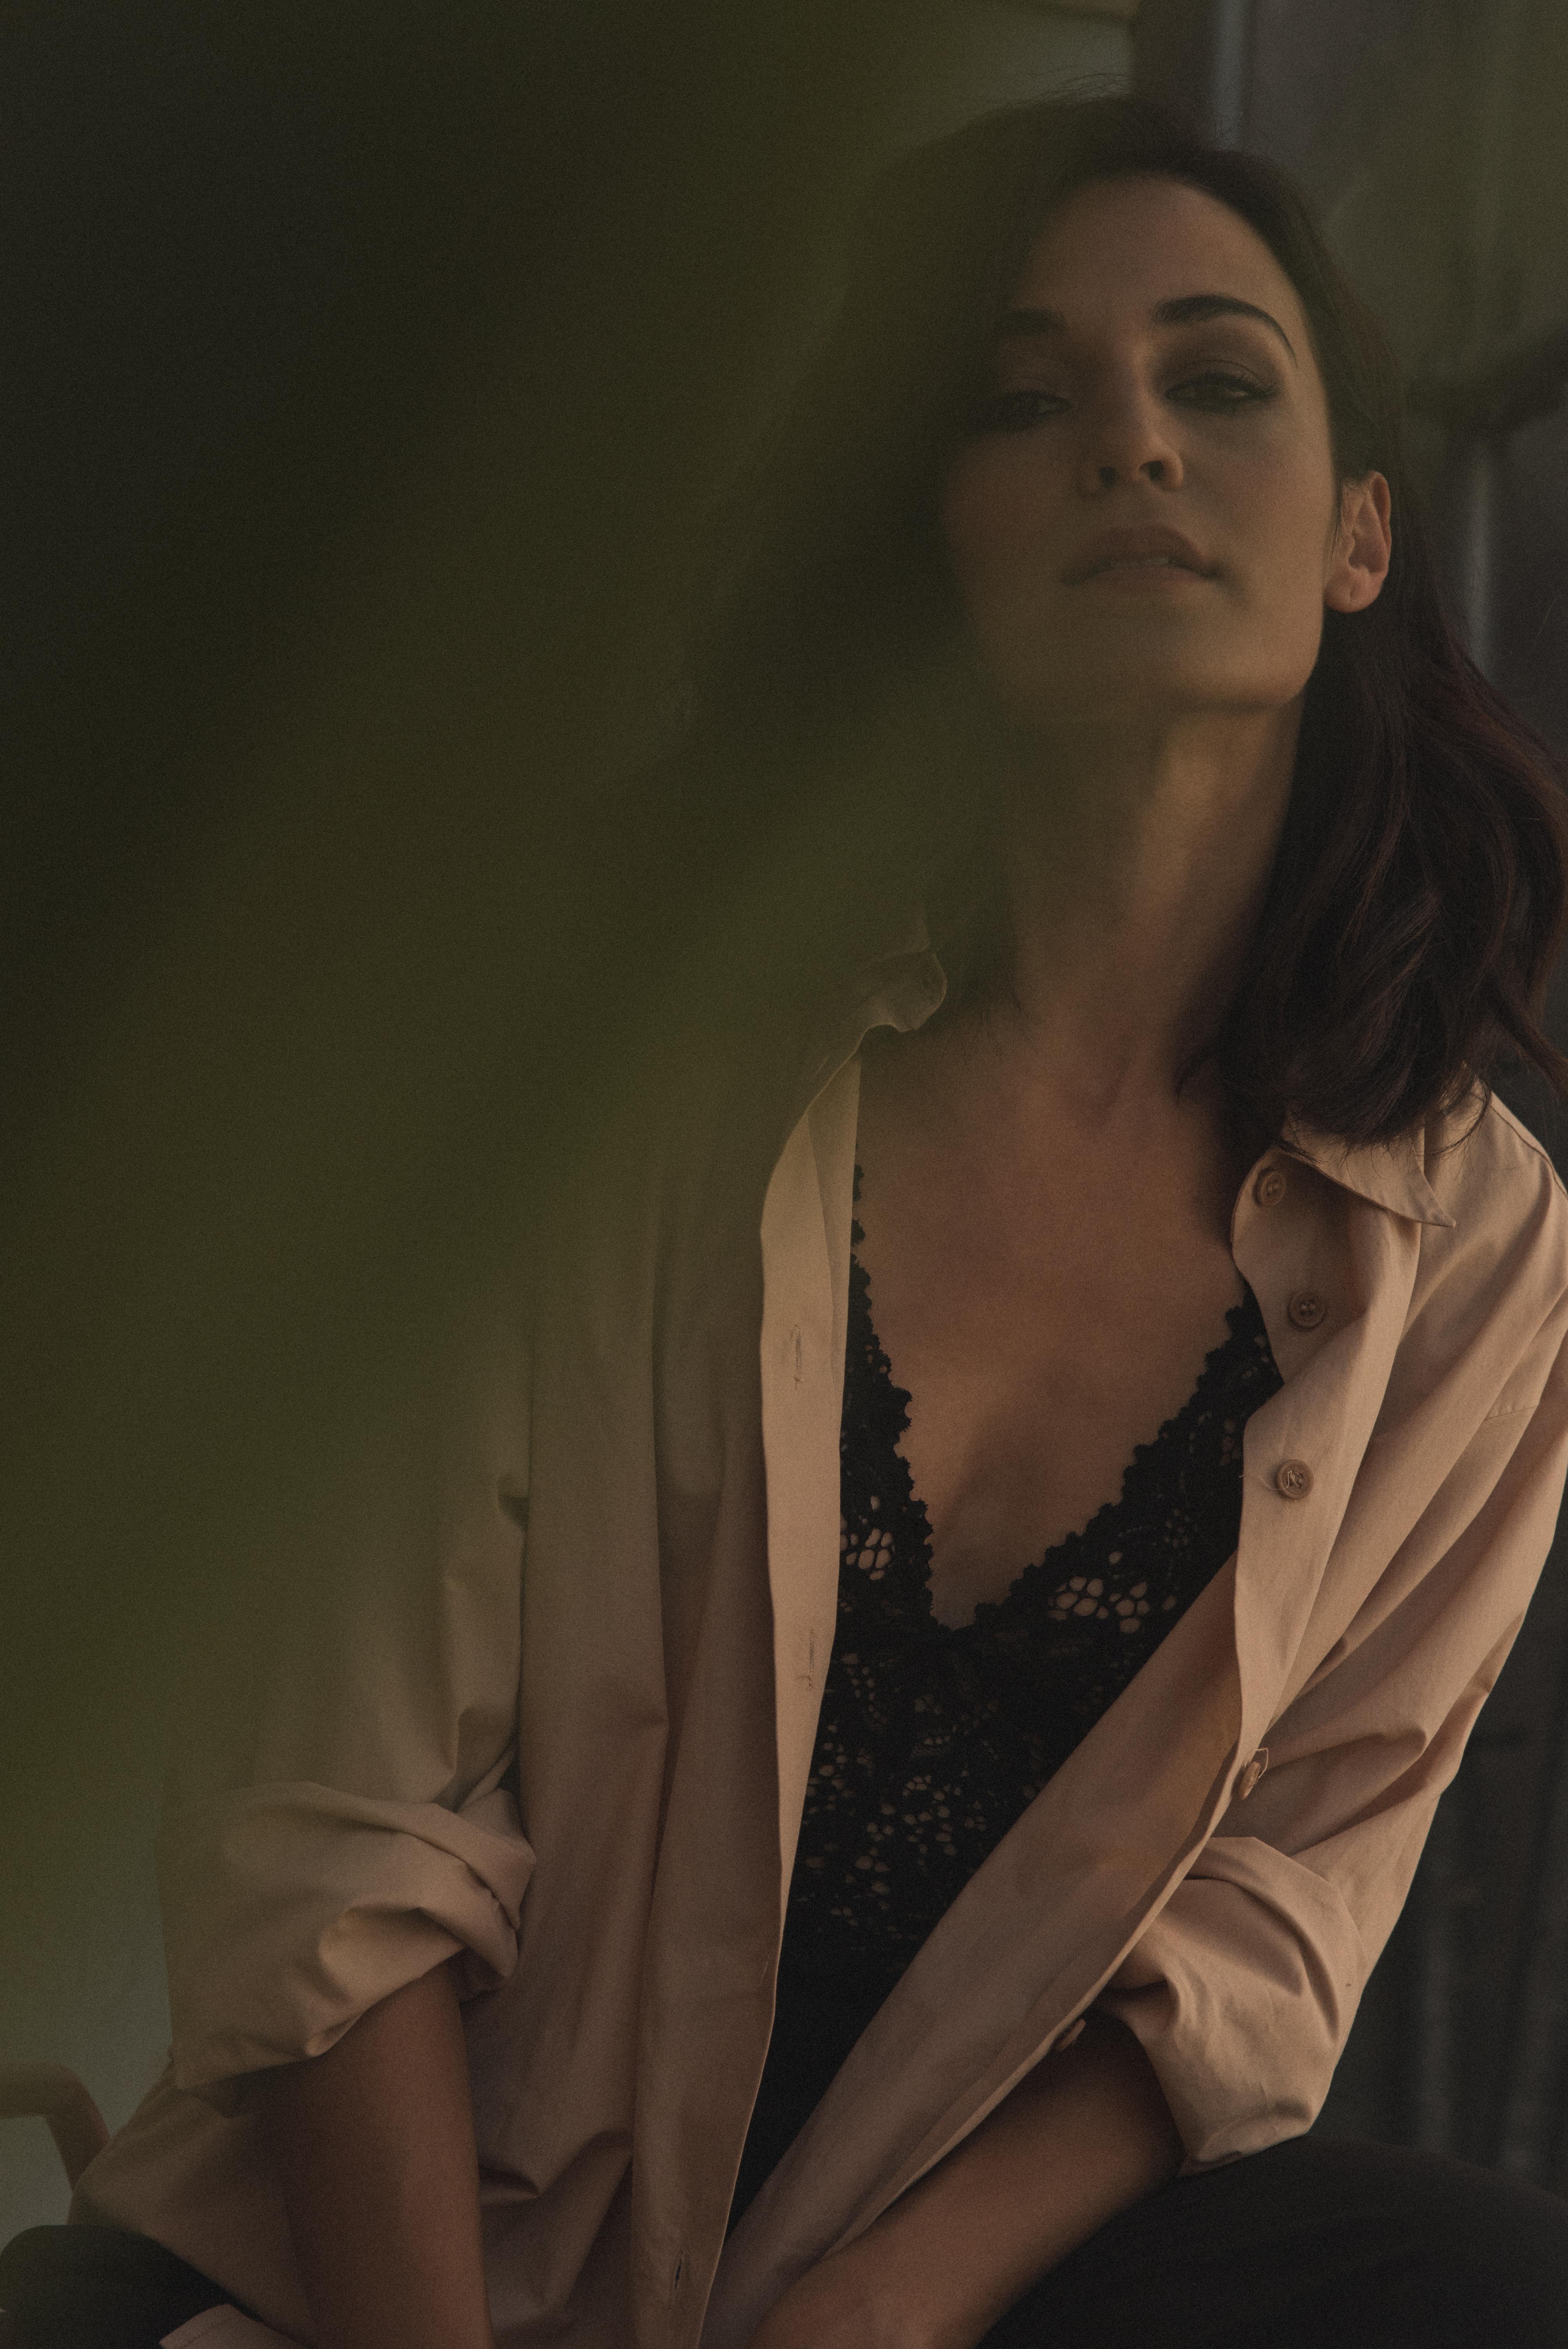 Señora Horticultora - Sara Rivero